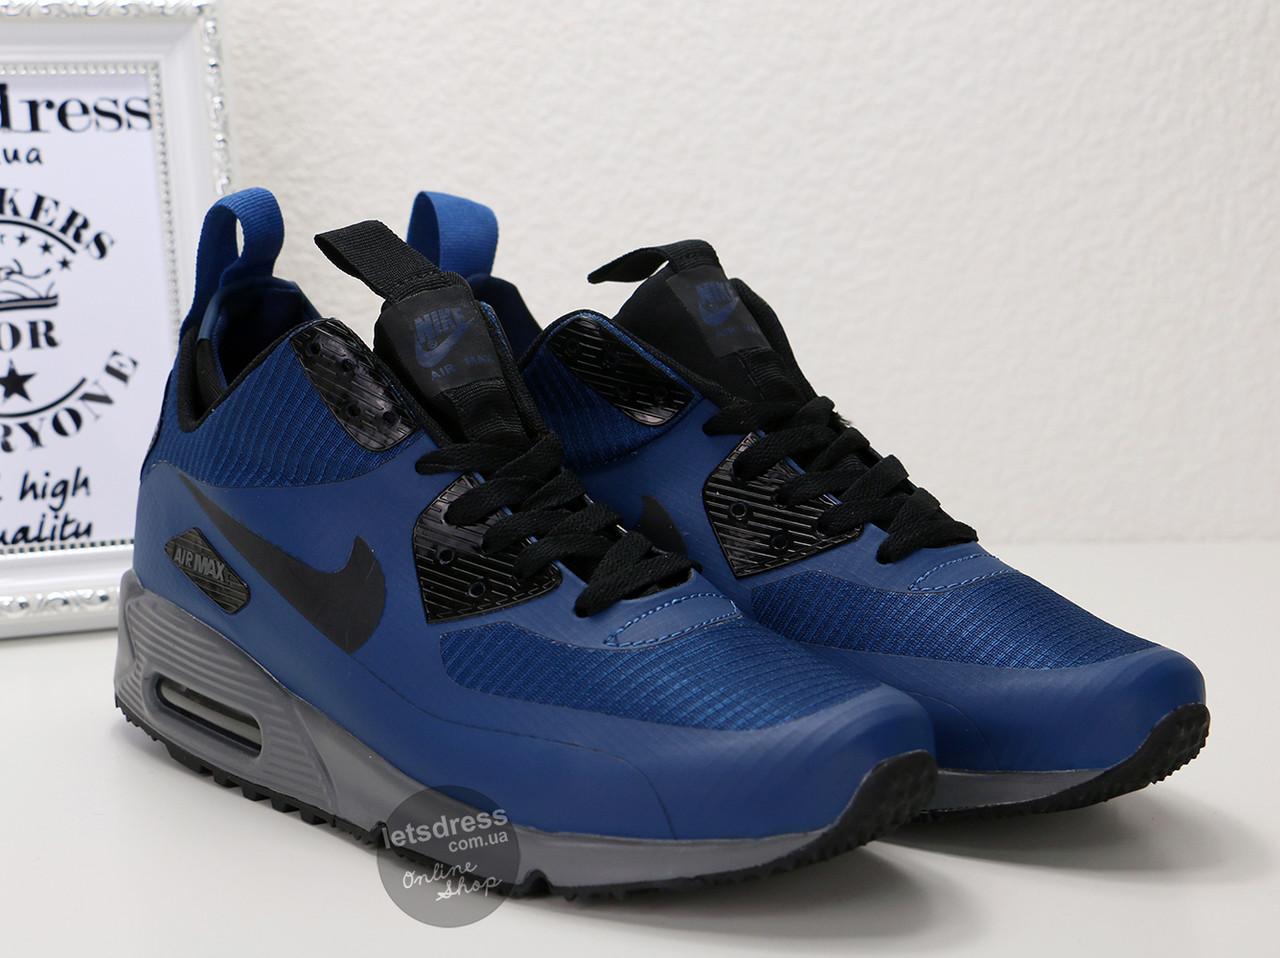 d3a1cd64 Кроссовки мужские Nike Air Max 90 Mid Winter | Найк Аир Макс 90 Мид -  LetsDress